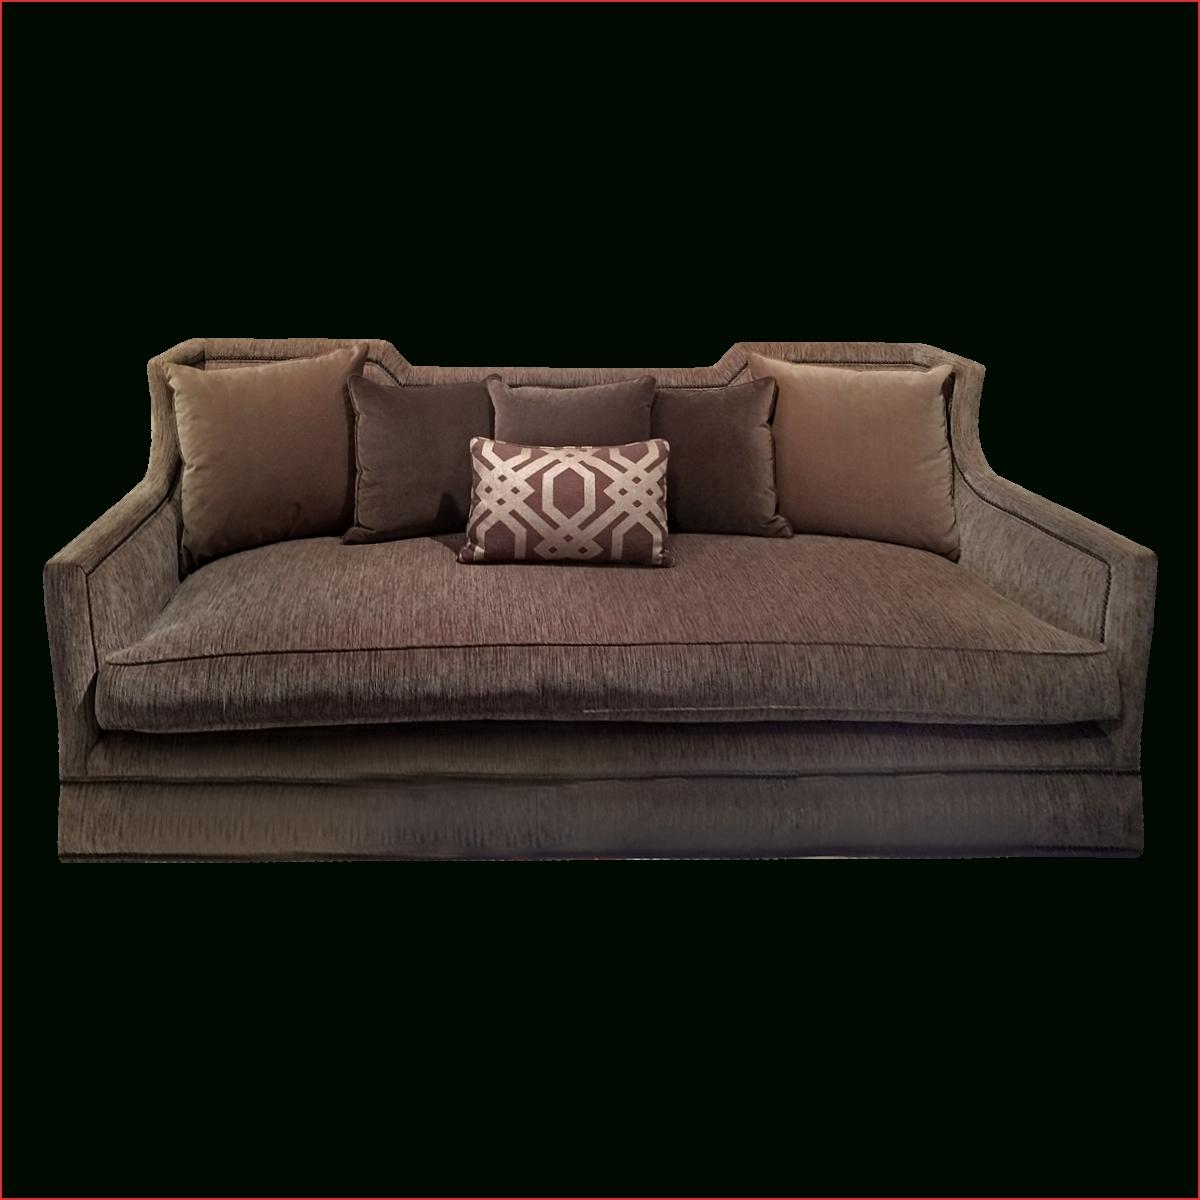 Burton James Sofa Beautiful Sofa Burton James – Hkspa | Hkspa Pertaining To Burton James Sofas (Image 7 of 20)